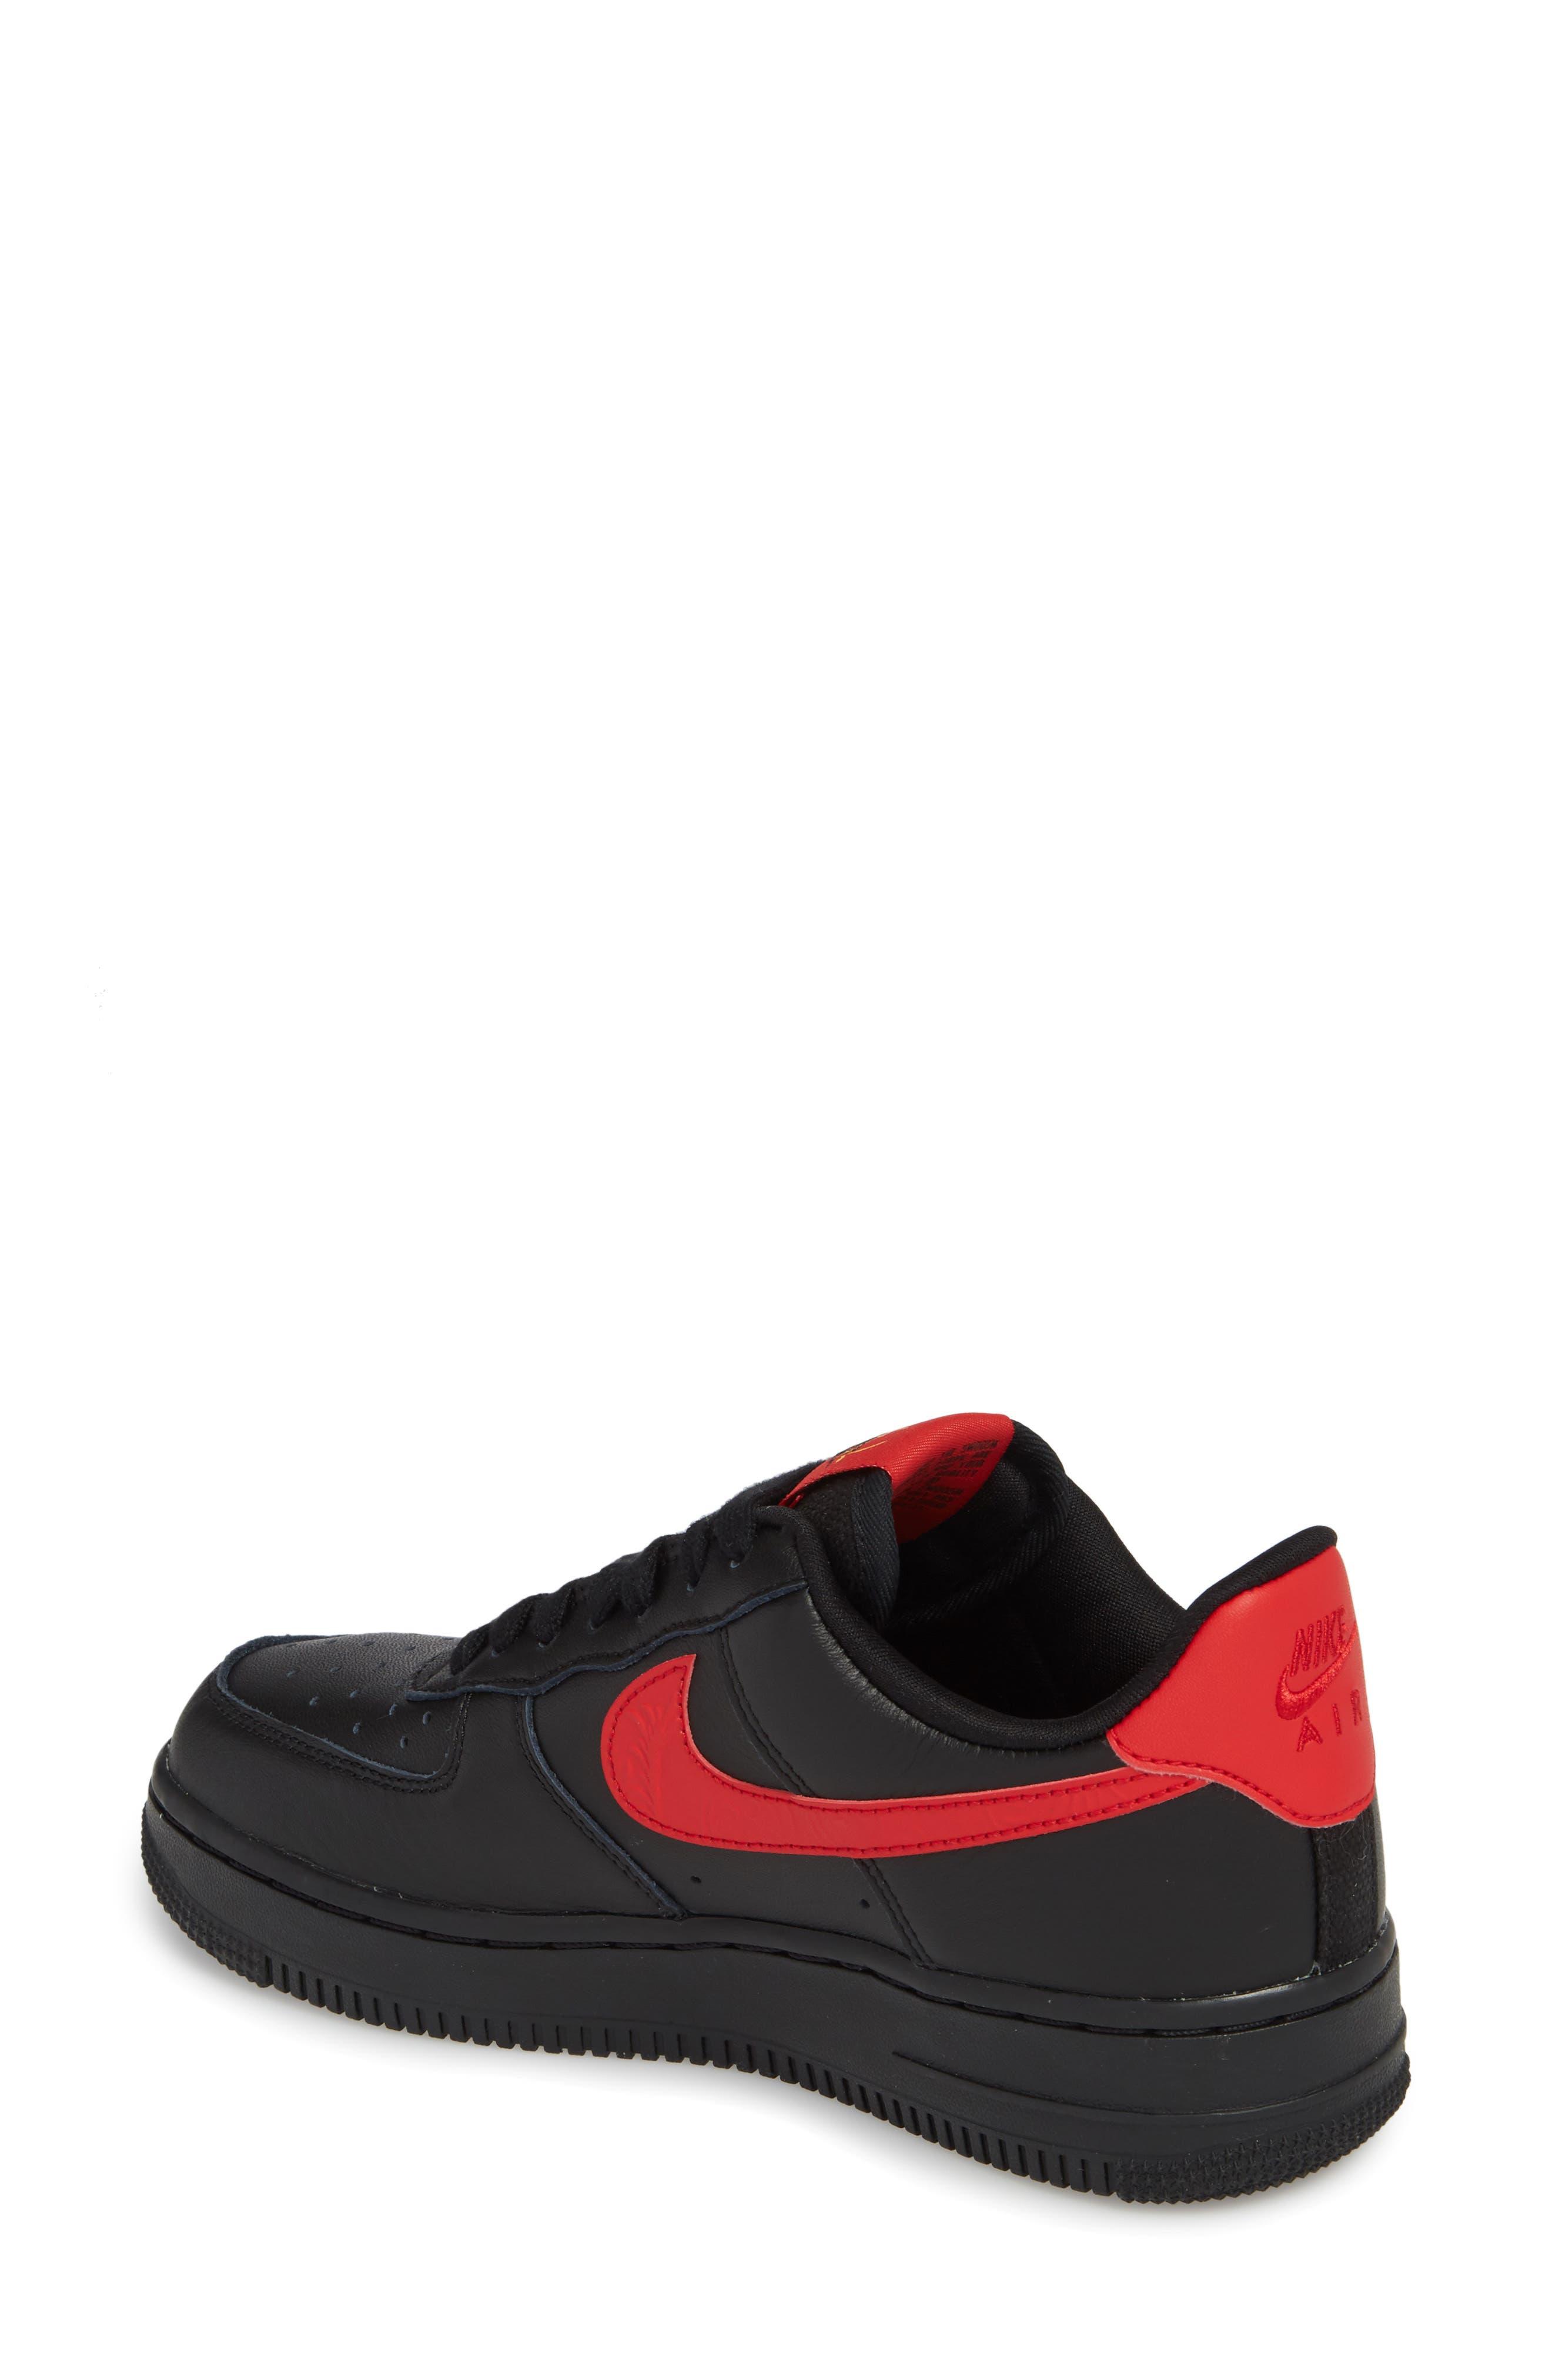 Air Force 1 '07 Sneaker,                             Alternate thumbnail 2, color,                             Black/ University Red